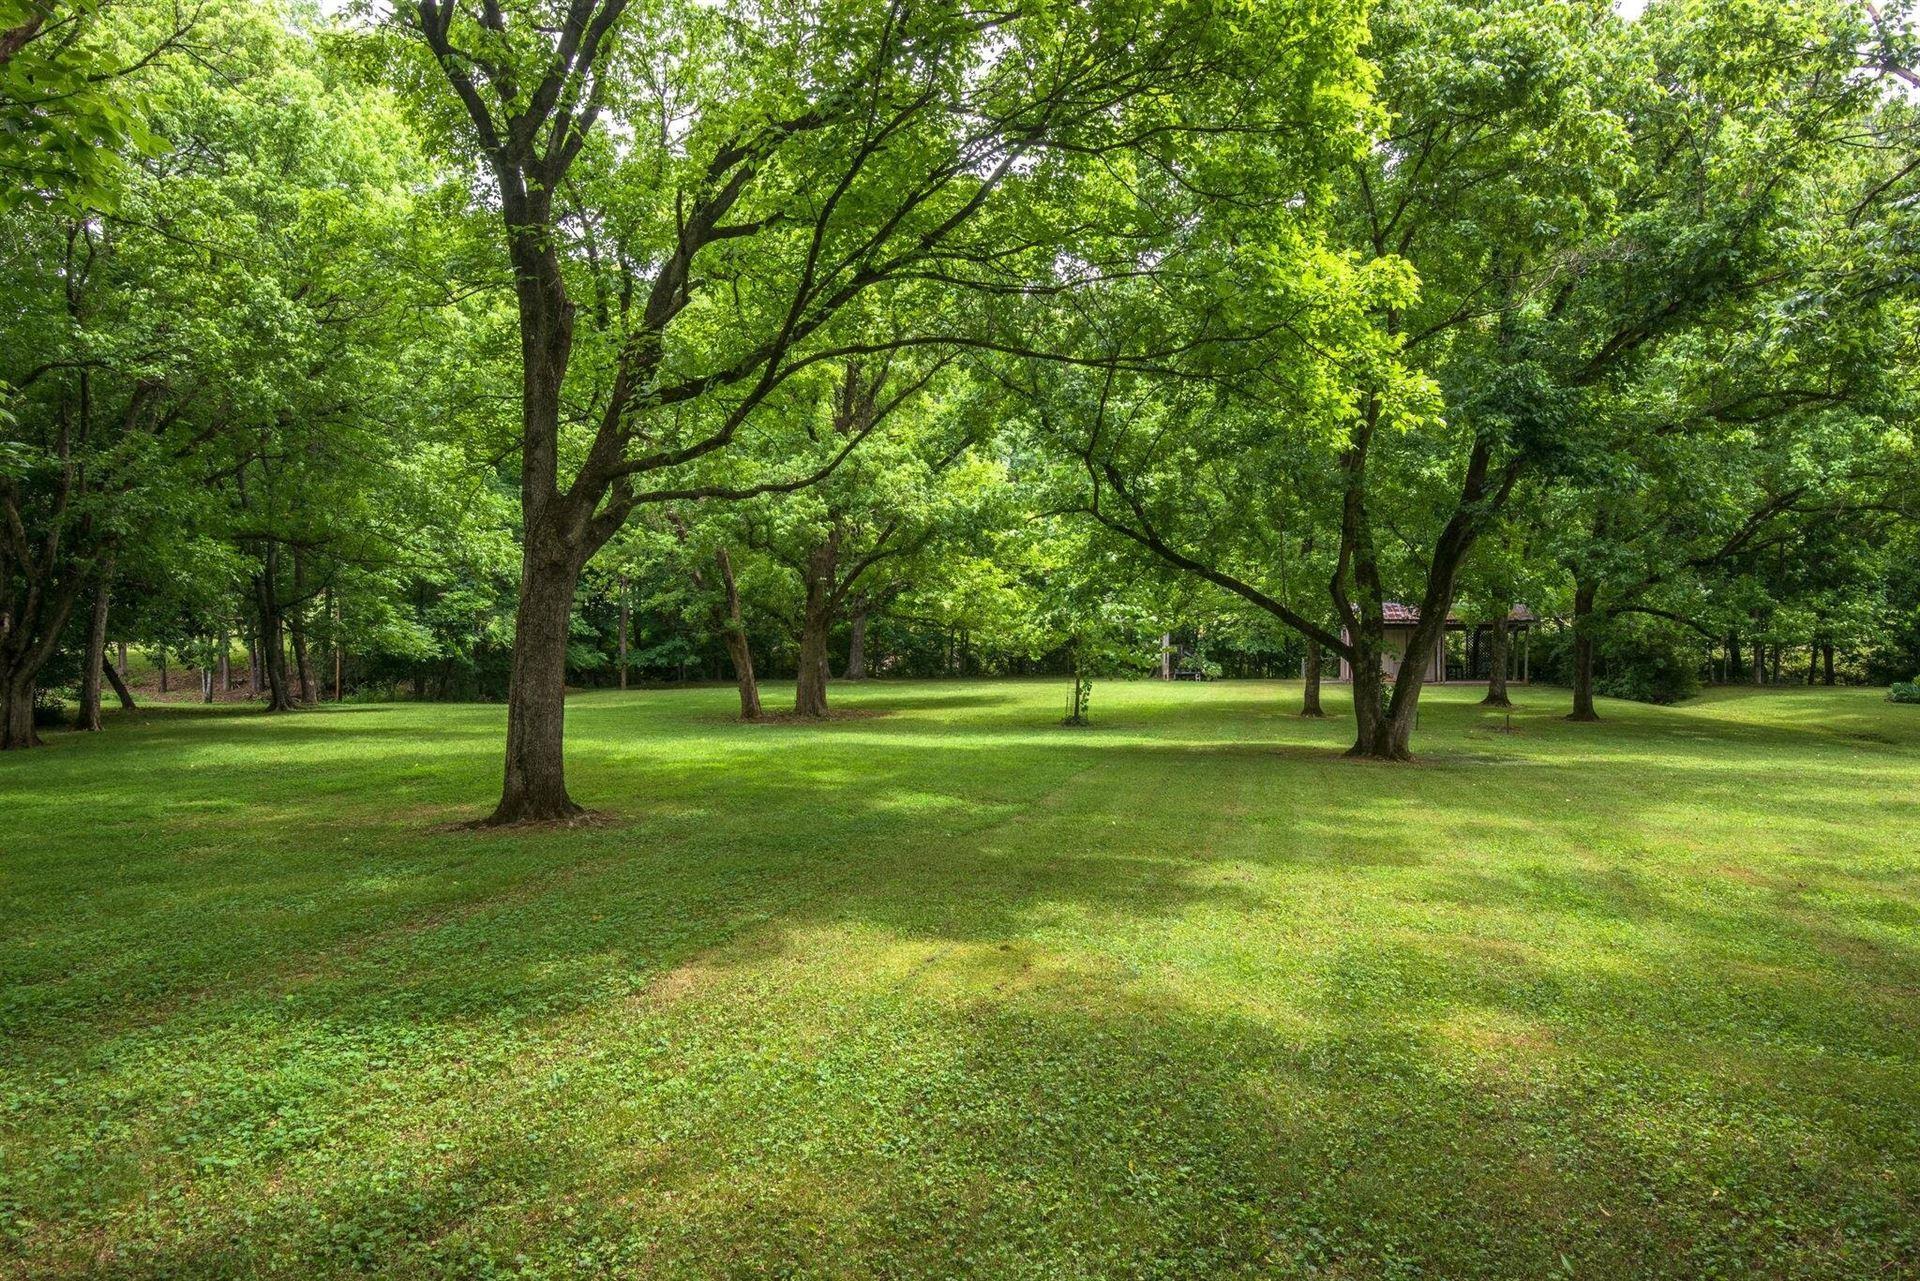 Photo of 0 Holly Tree Gap Road, Brentwood, TN 37027 (MLS # 2302757)